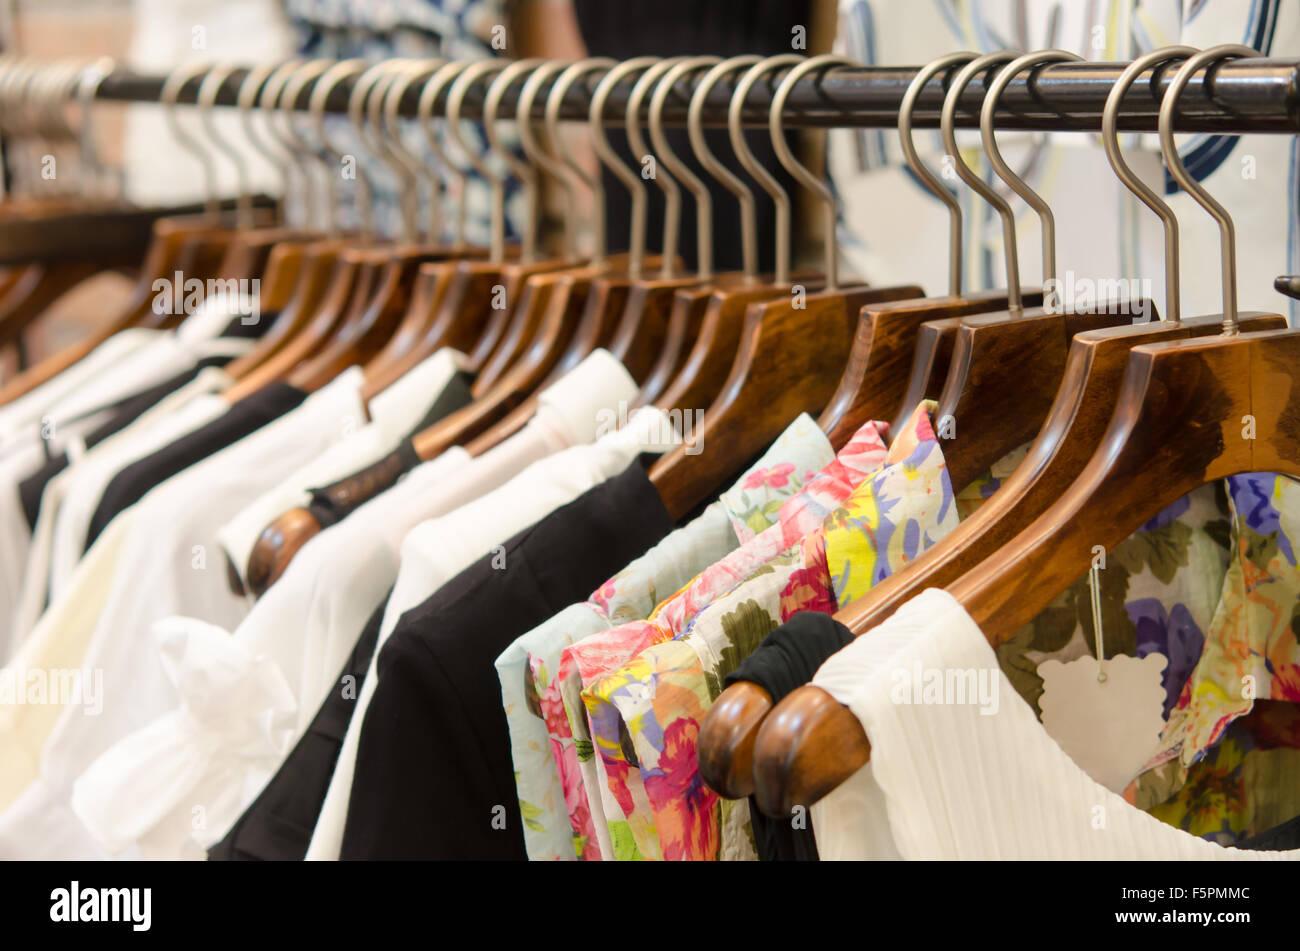 Appendiabiti Pantaloni.Appendiabiti Pantaloni E Gonne Per Donna Foto Immagine Stock